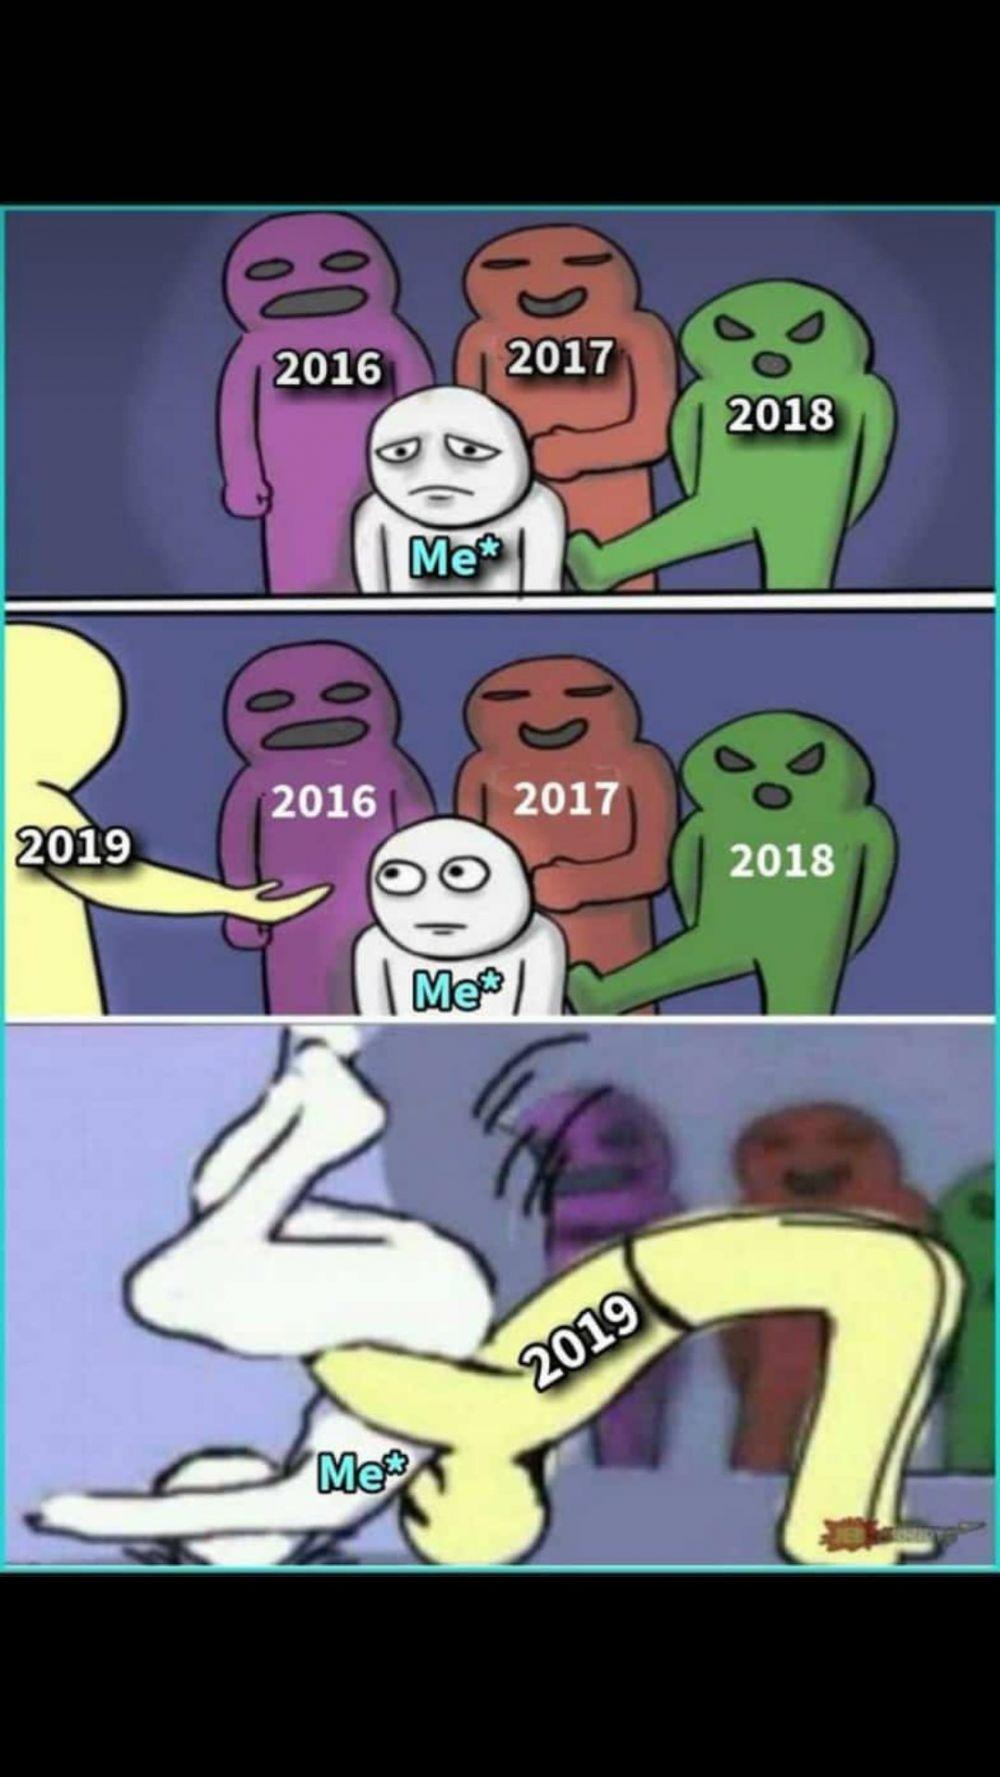 15 Meme Lucu Harapan Di 2019 Ini Bikin Ngakak Prihatin